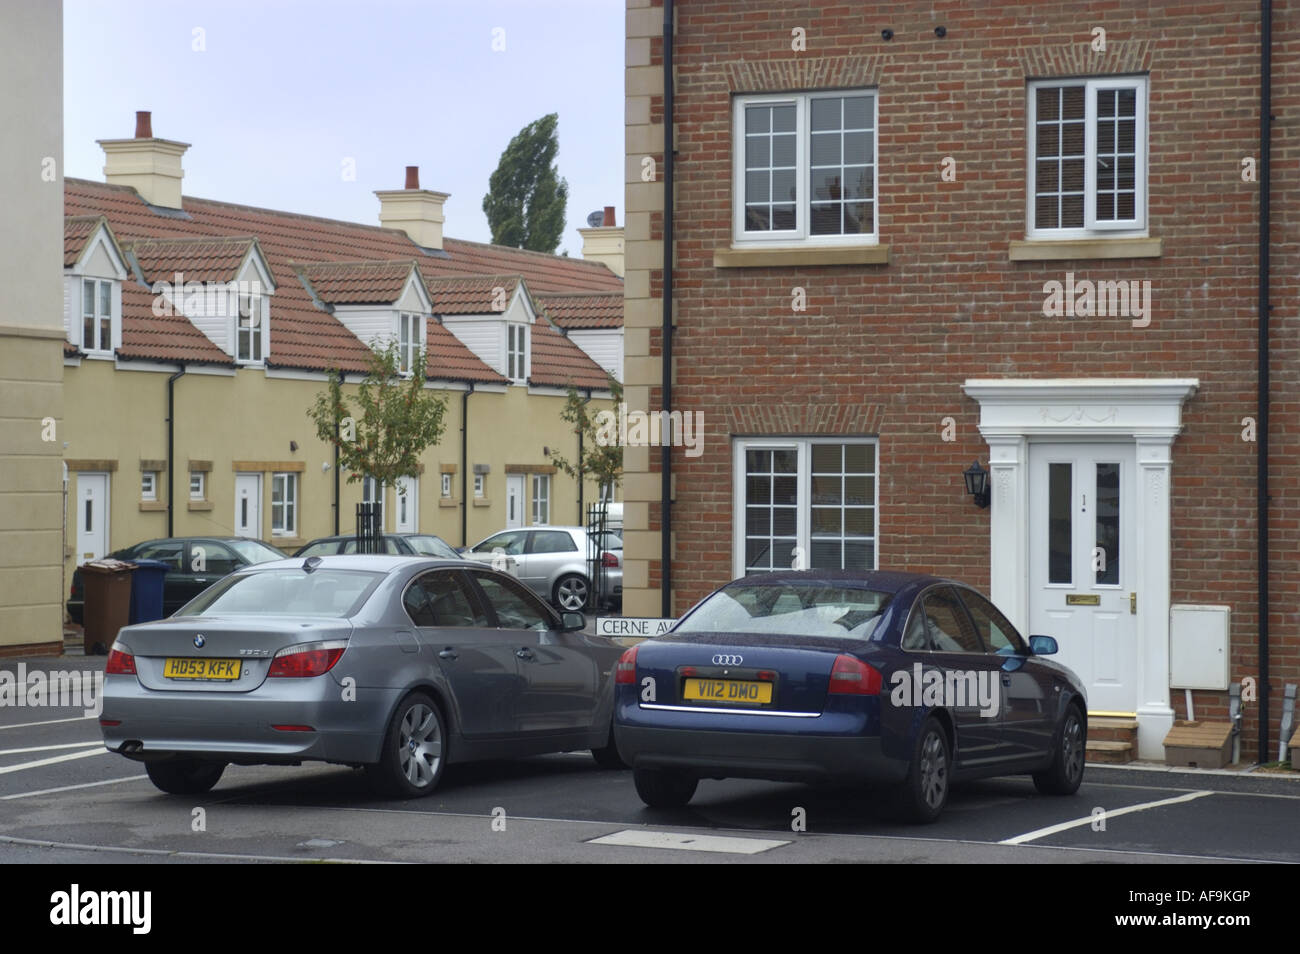 New Estate in Gillingham North Dorset - Stock Image